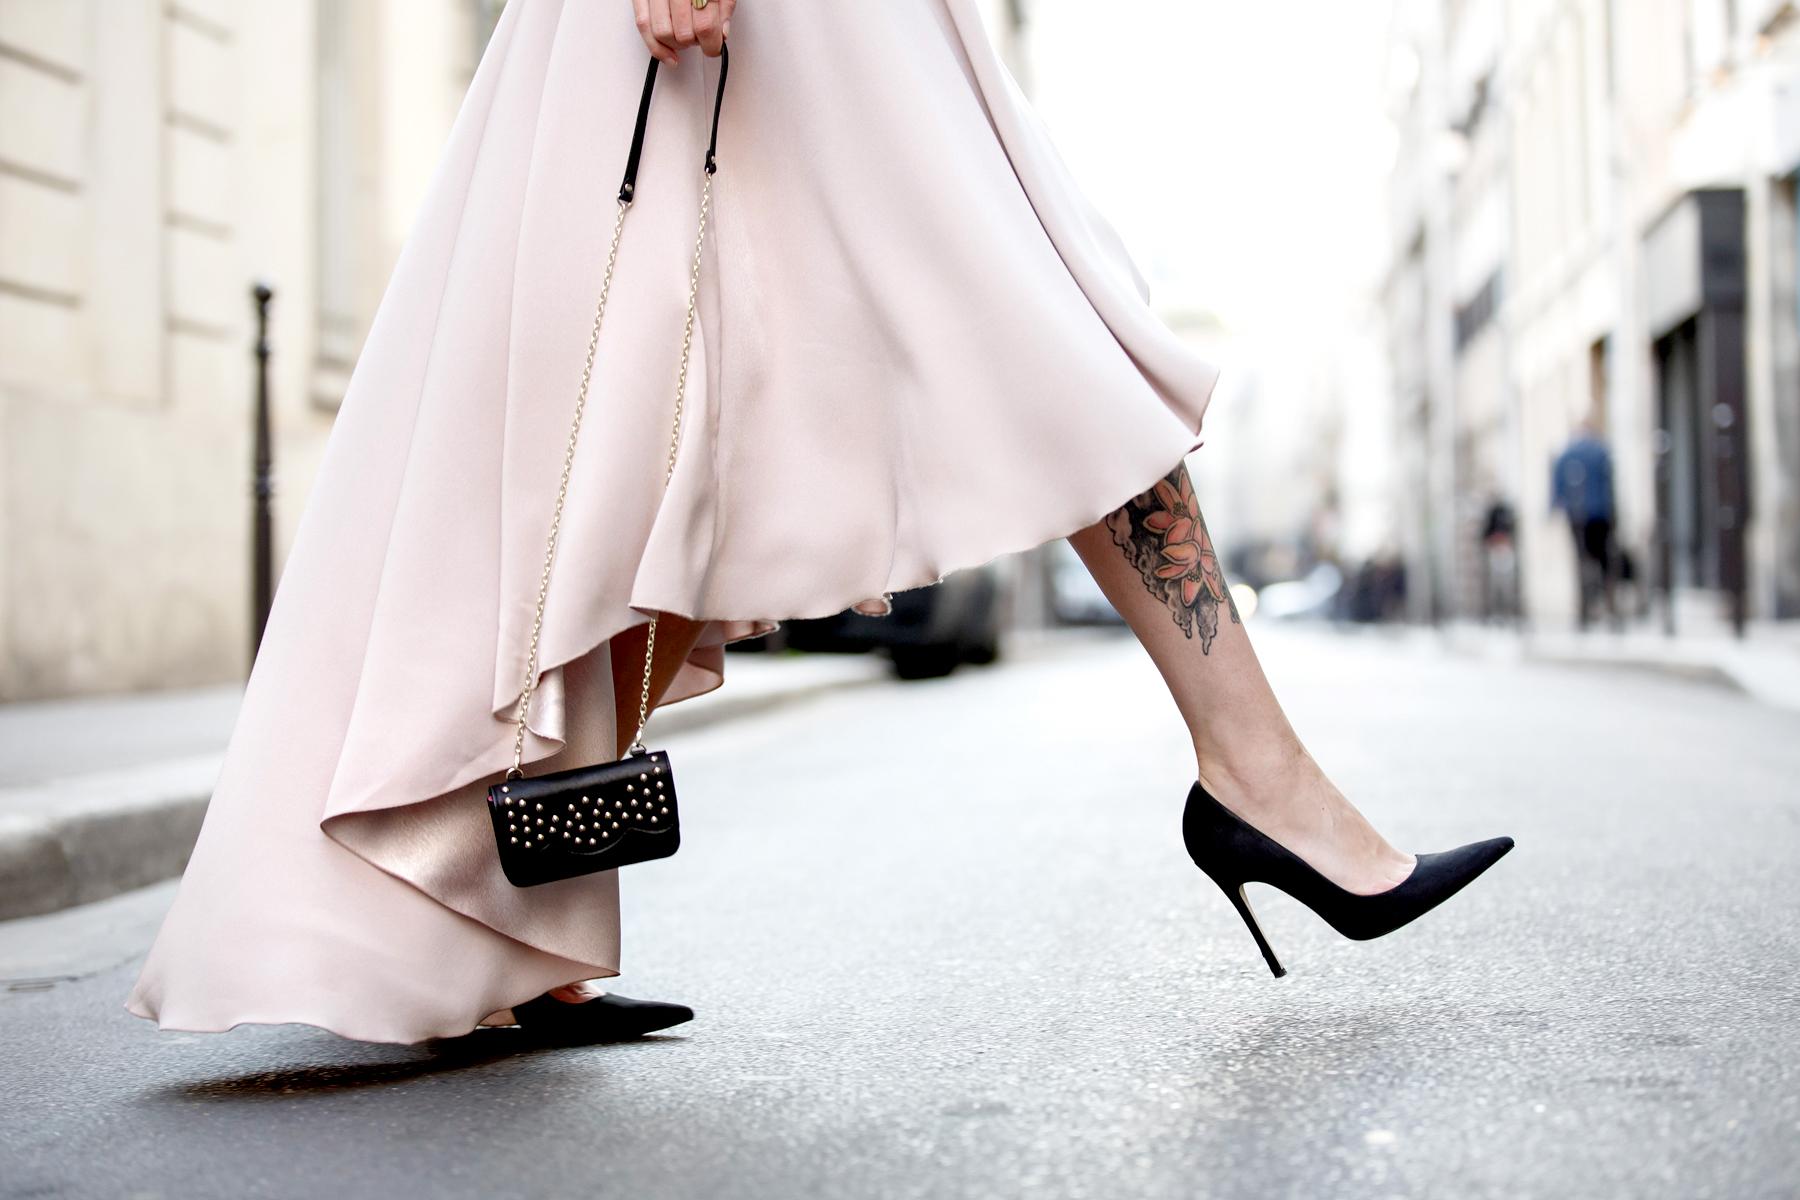 ewa herzog lace dress pastel rose paris le marais pfw fashion week ss16 ricarda schernus cats & dogs blog 4